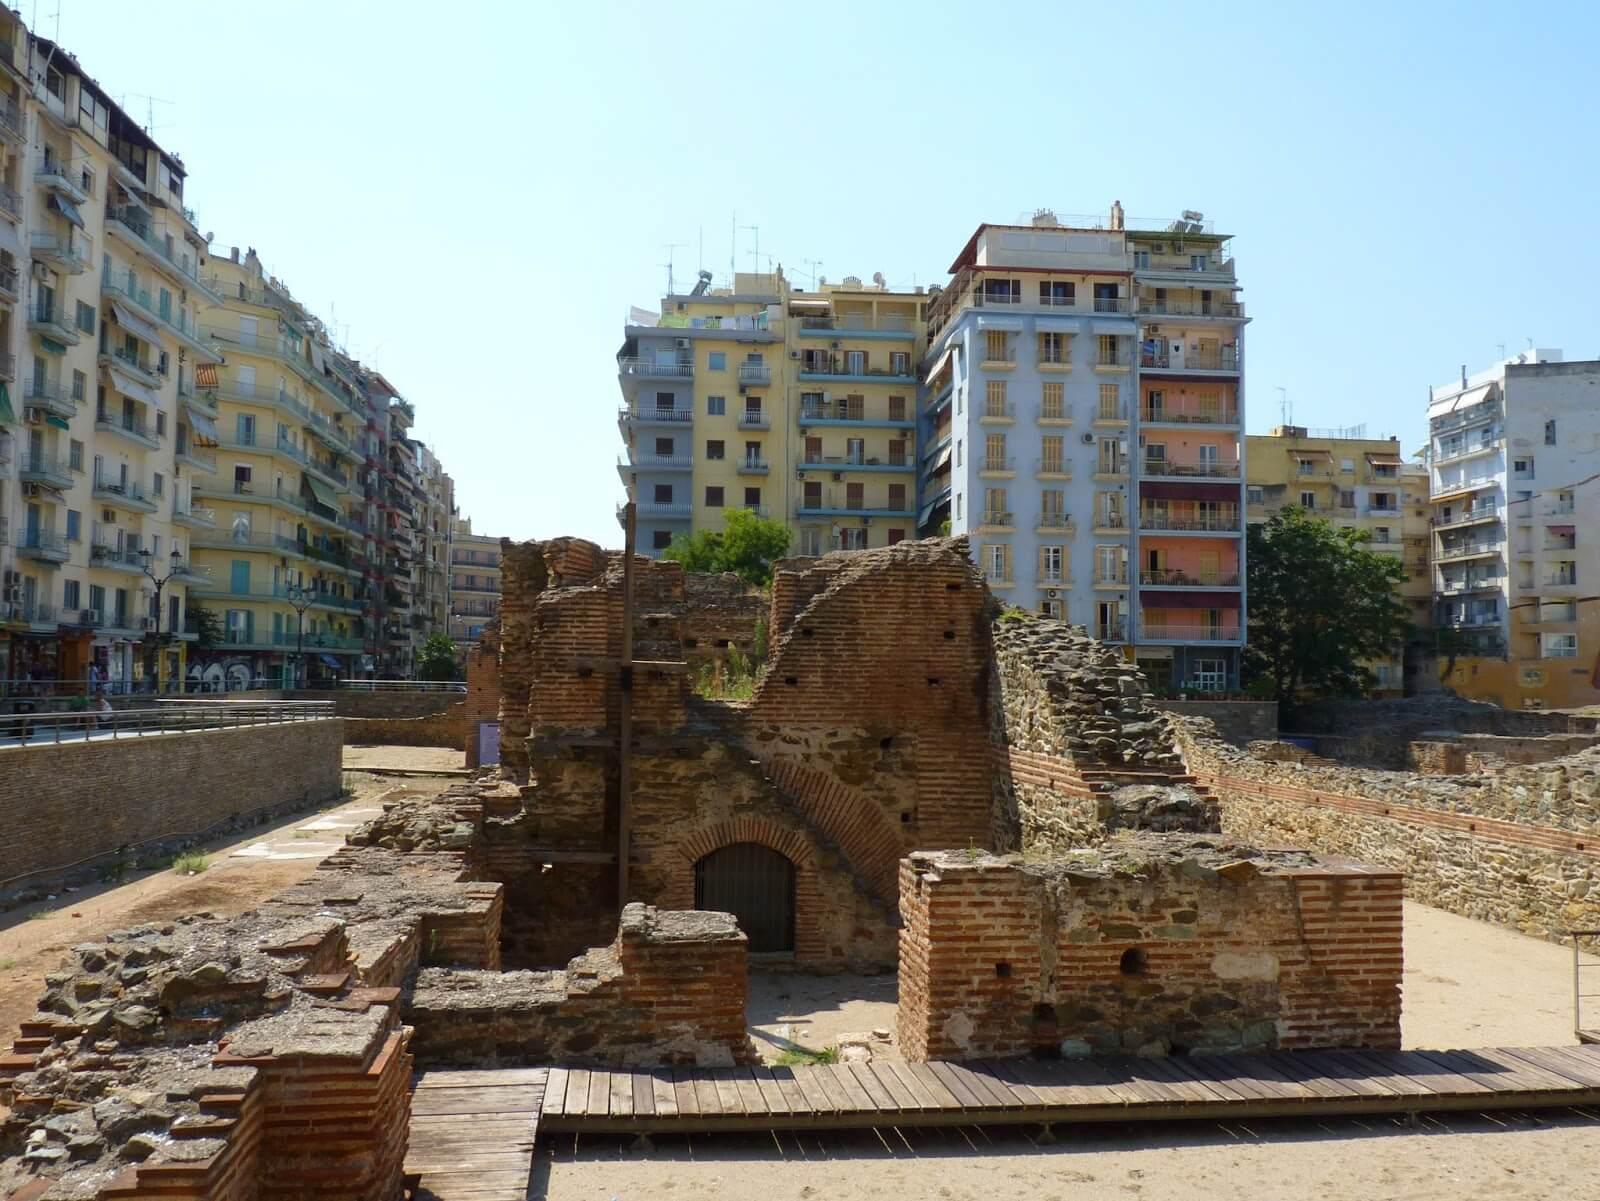 Salónica Grécia 03 Mundo Indefinido